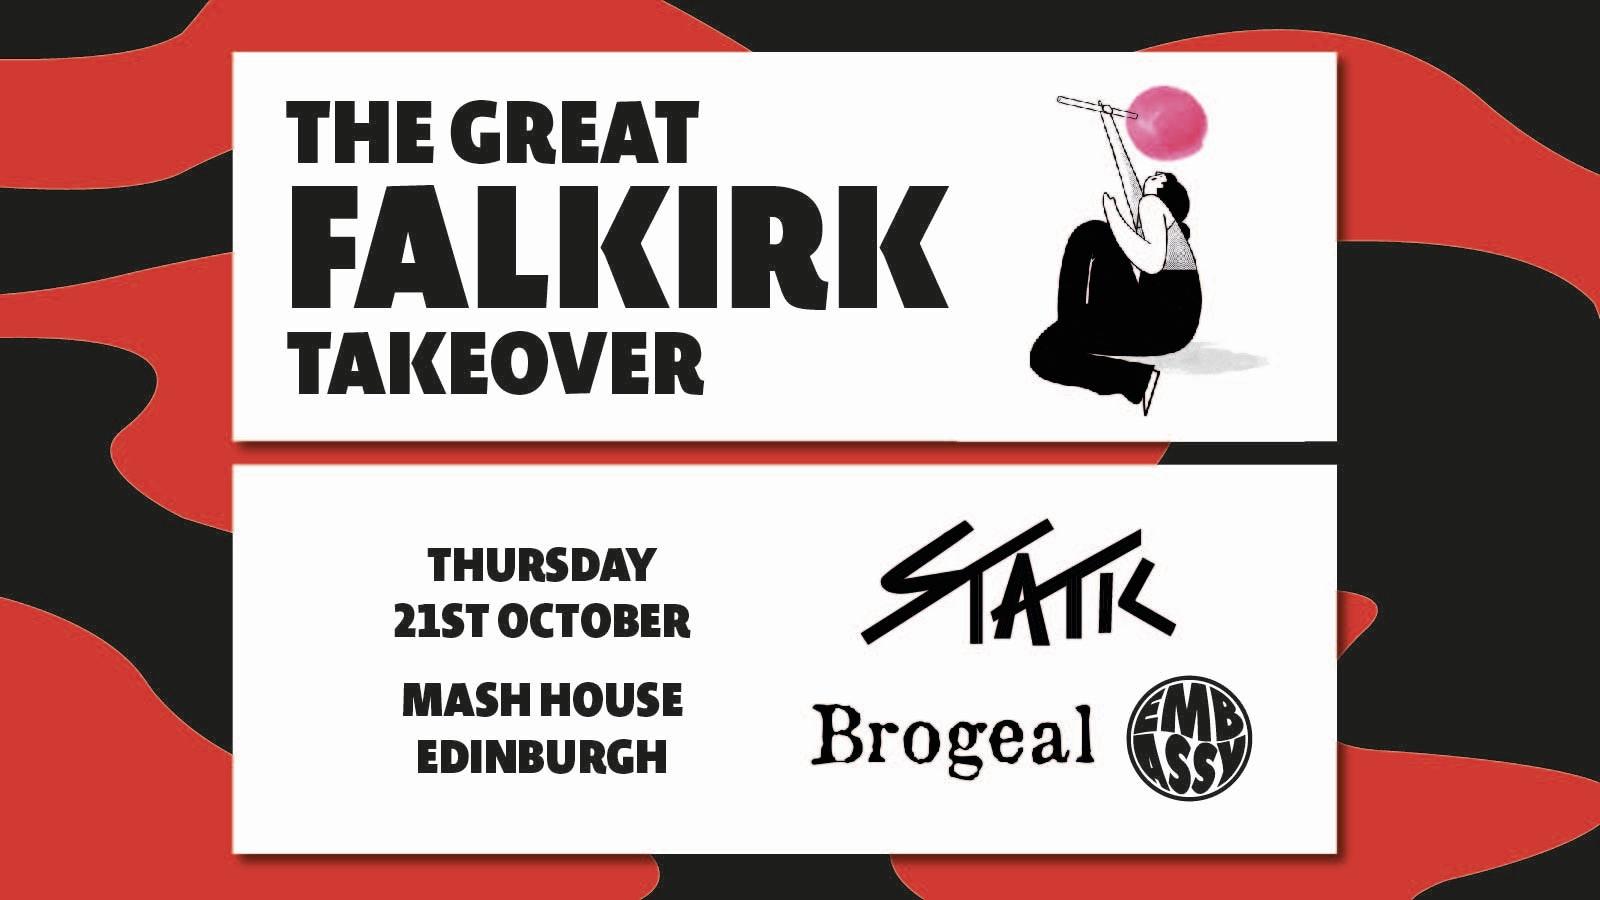 The Great Falkirk Takeover – Edinburgh